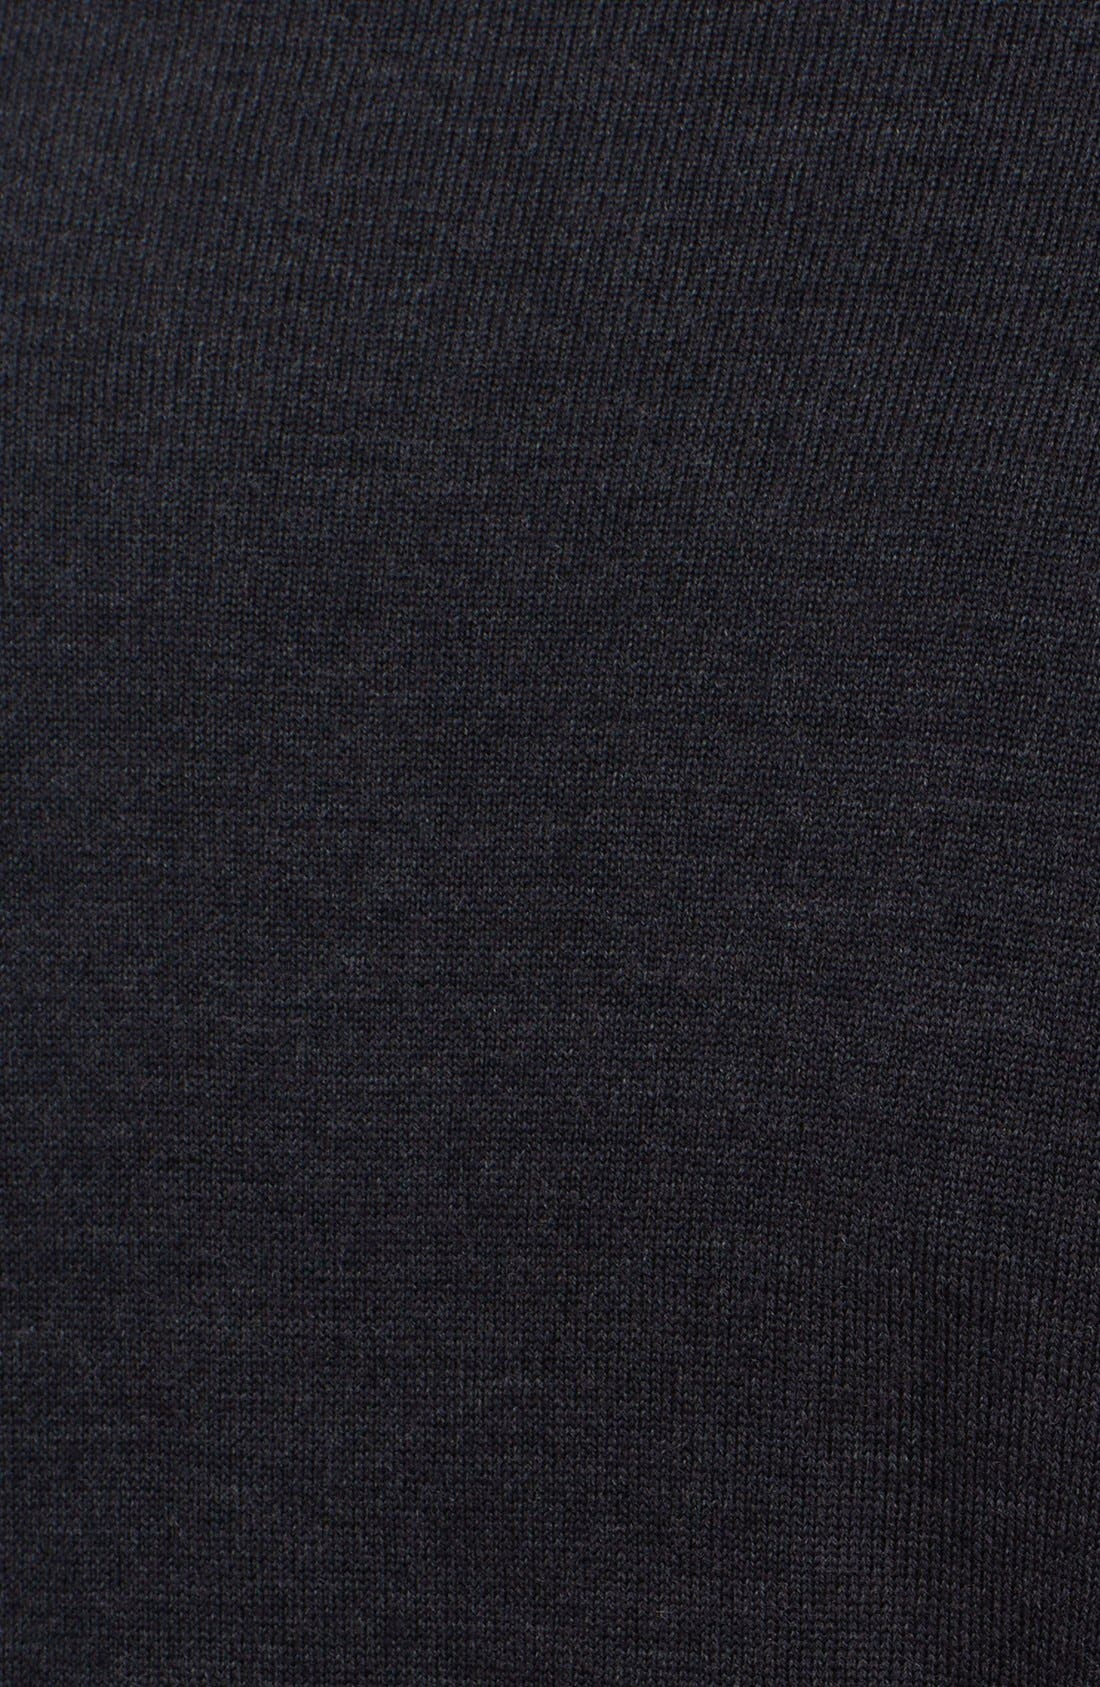 Alternate Image 3  - Armani Collezioni Wool Jersey Crewneck Sweater